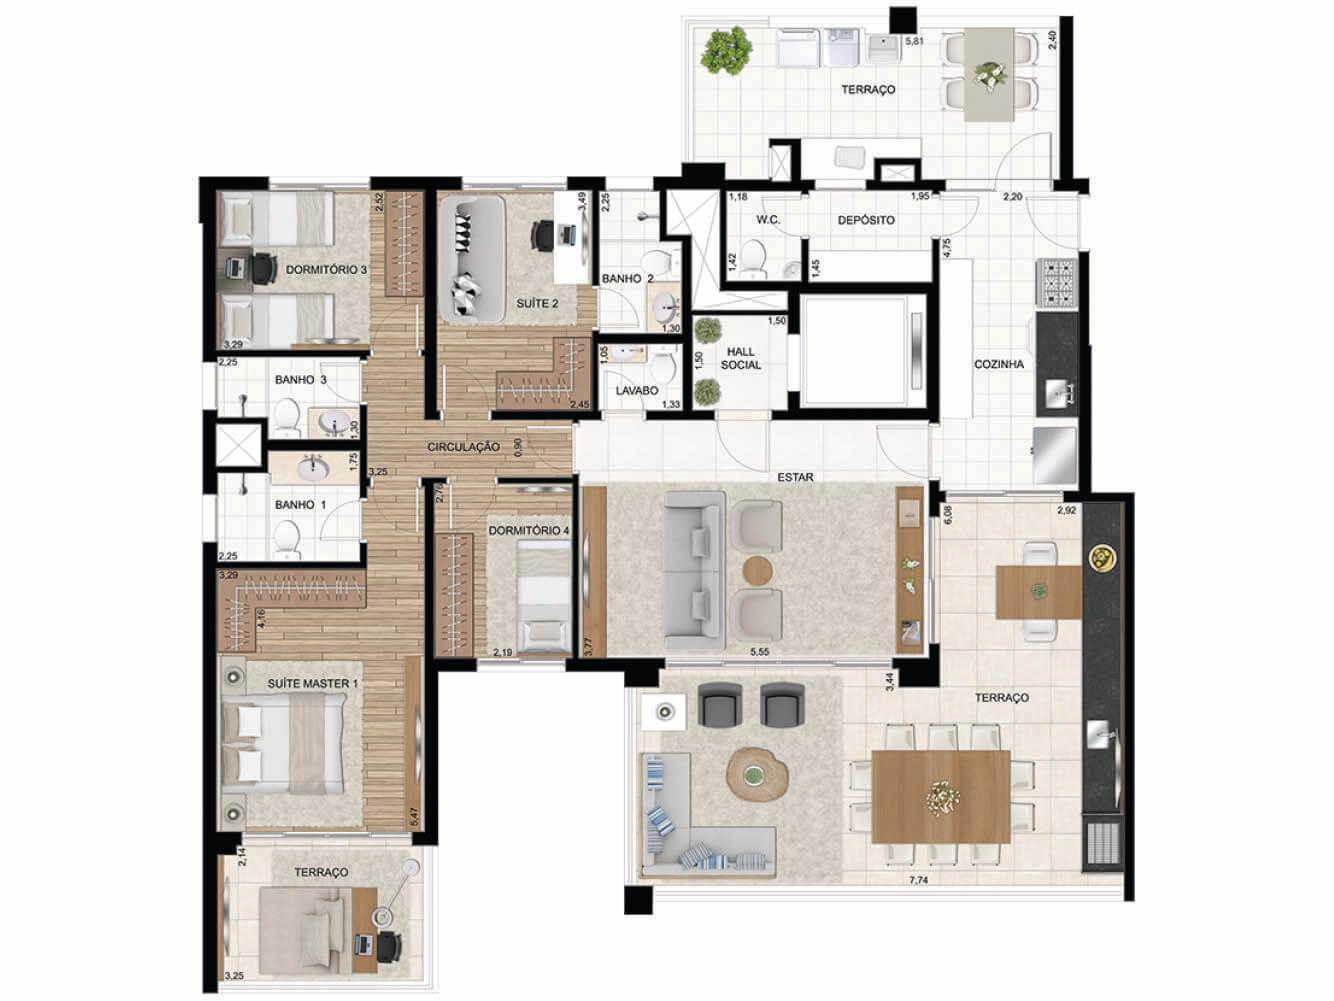 Apto. de 172 m2 - 2 Suítes (4 dorms)